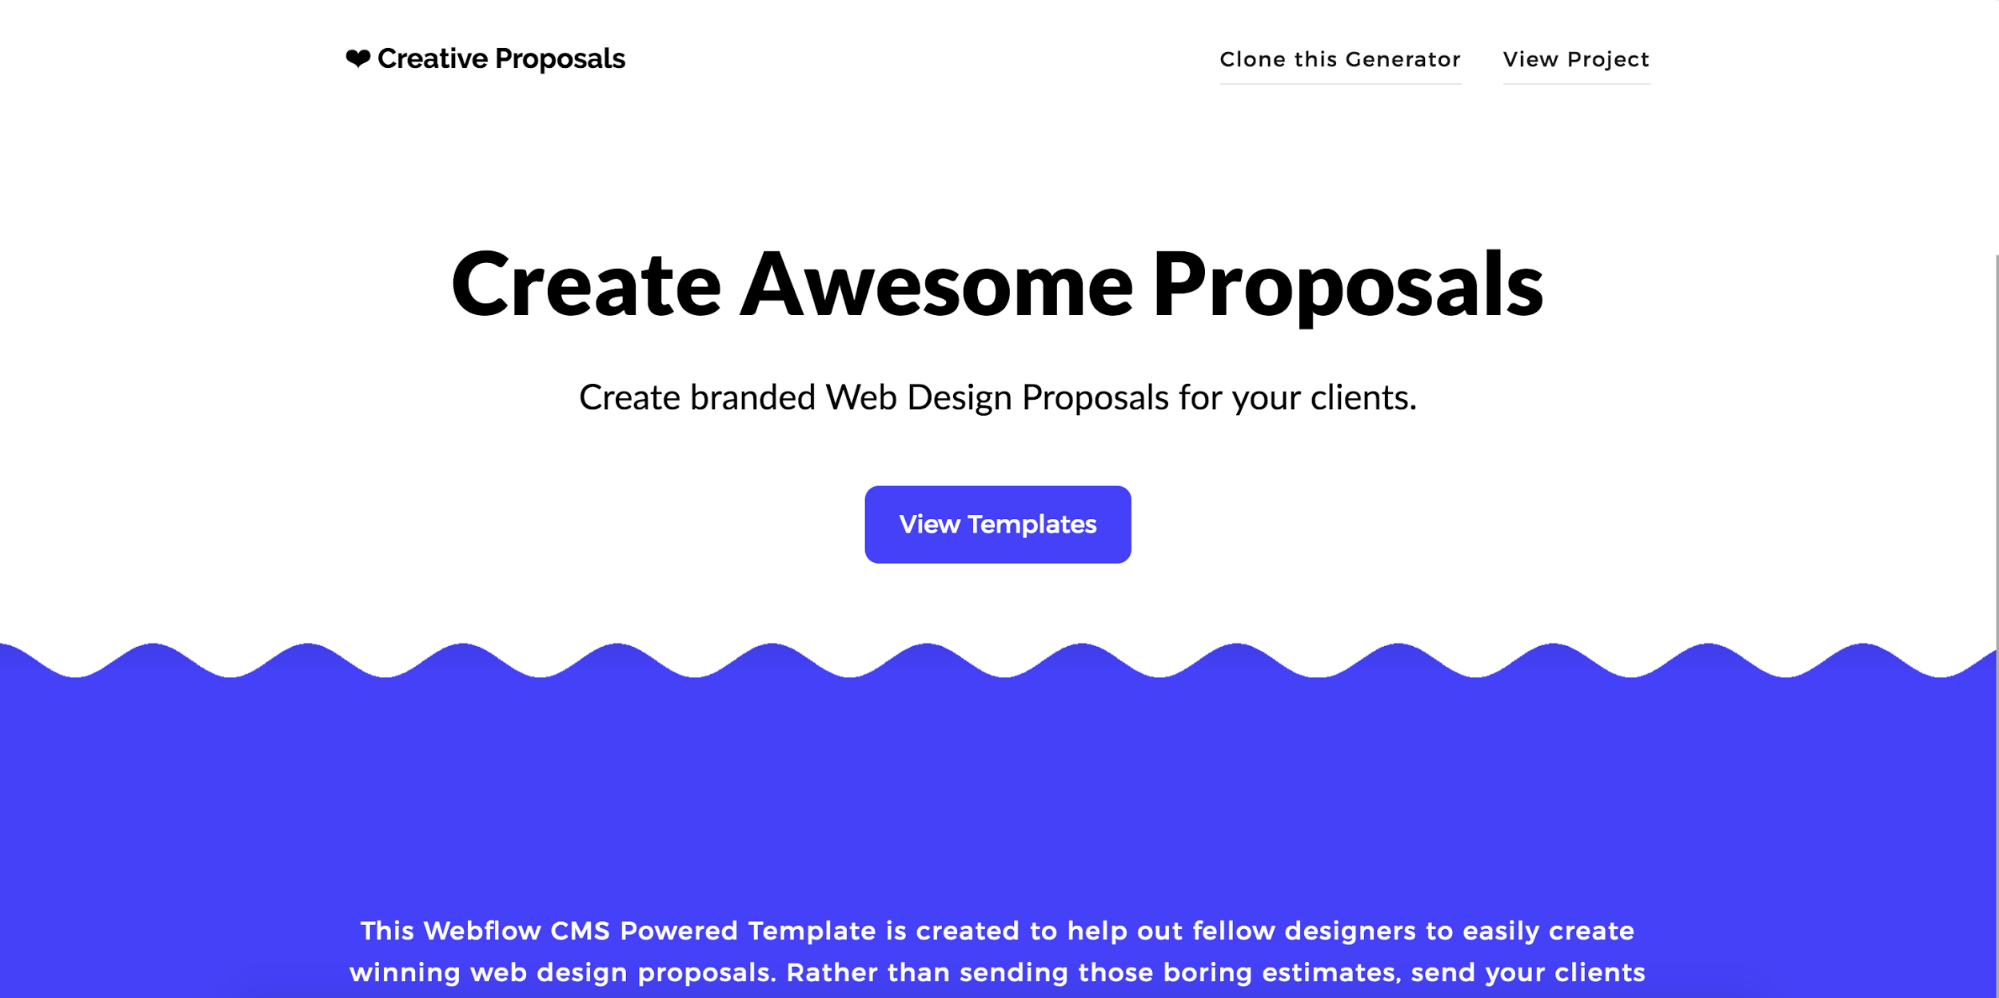 Web Design Proposal Generator - Webflow